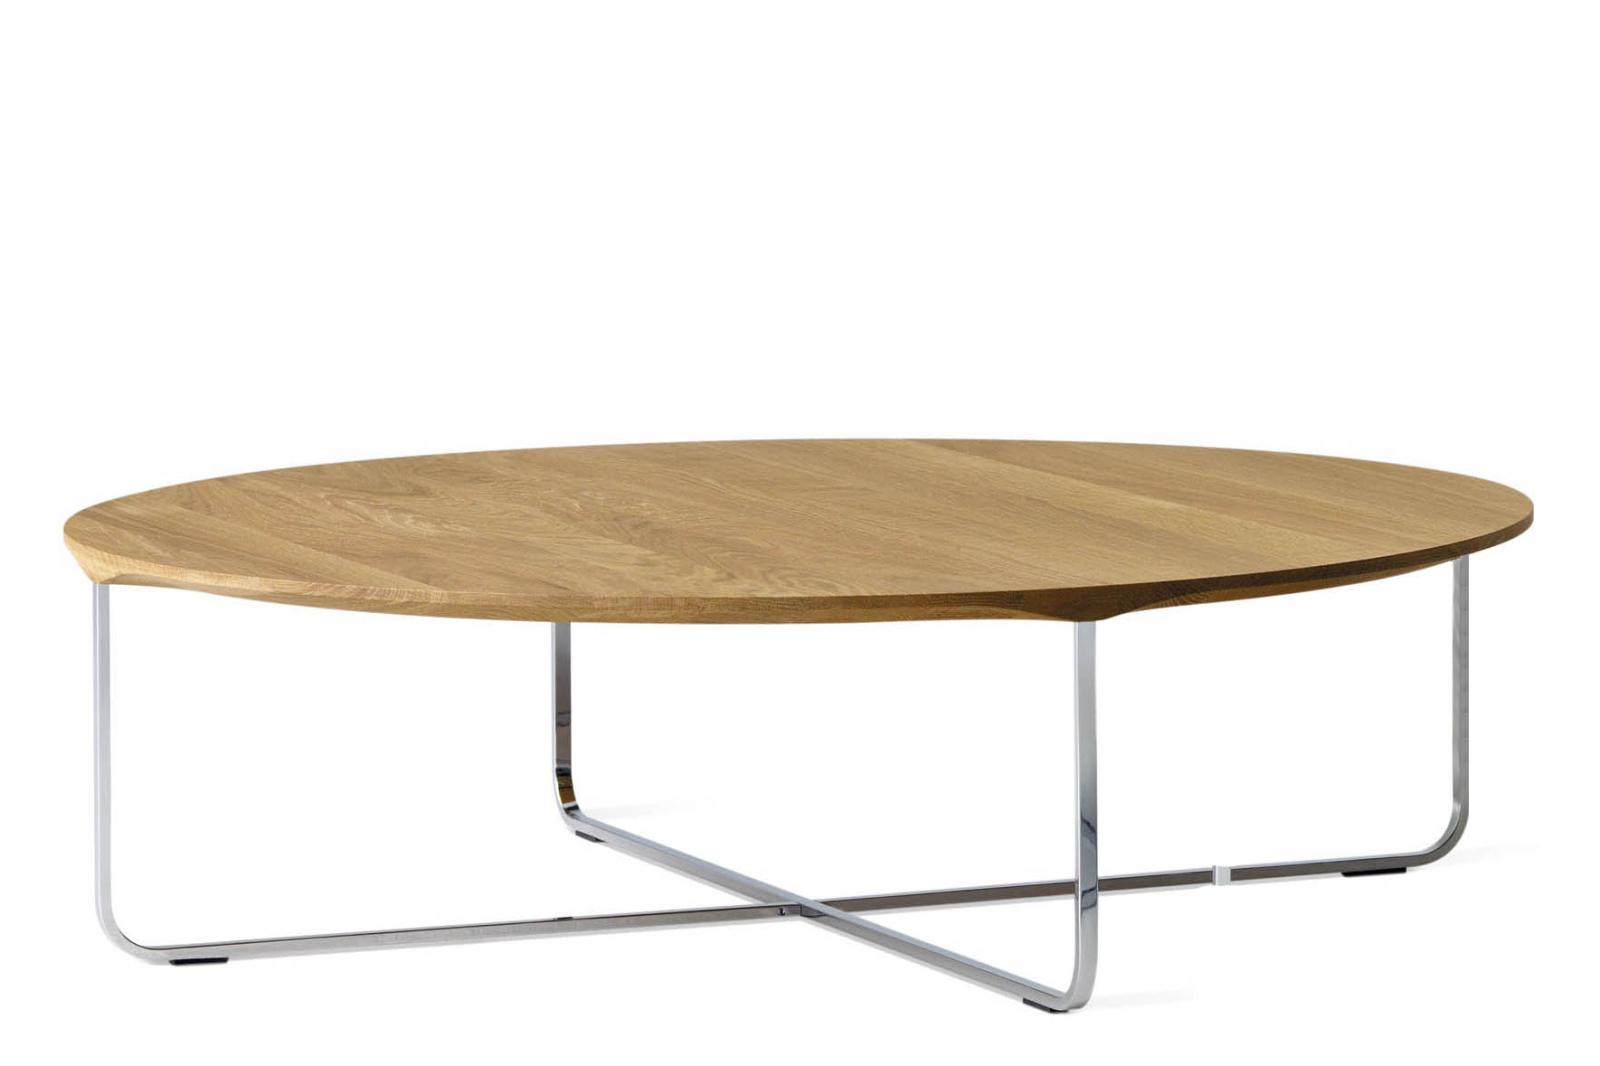 Flint Round Coffee Table White Oil Oak, Large